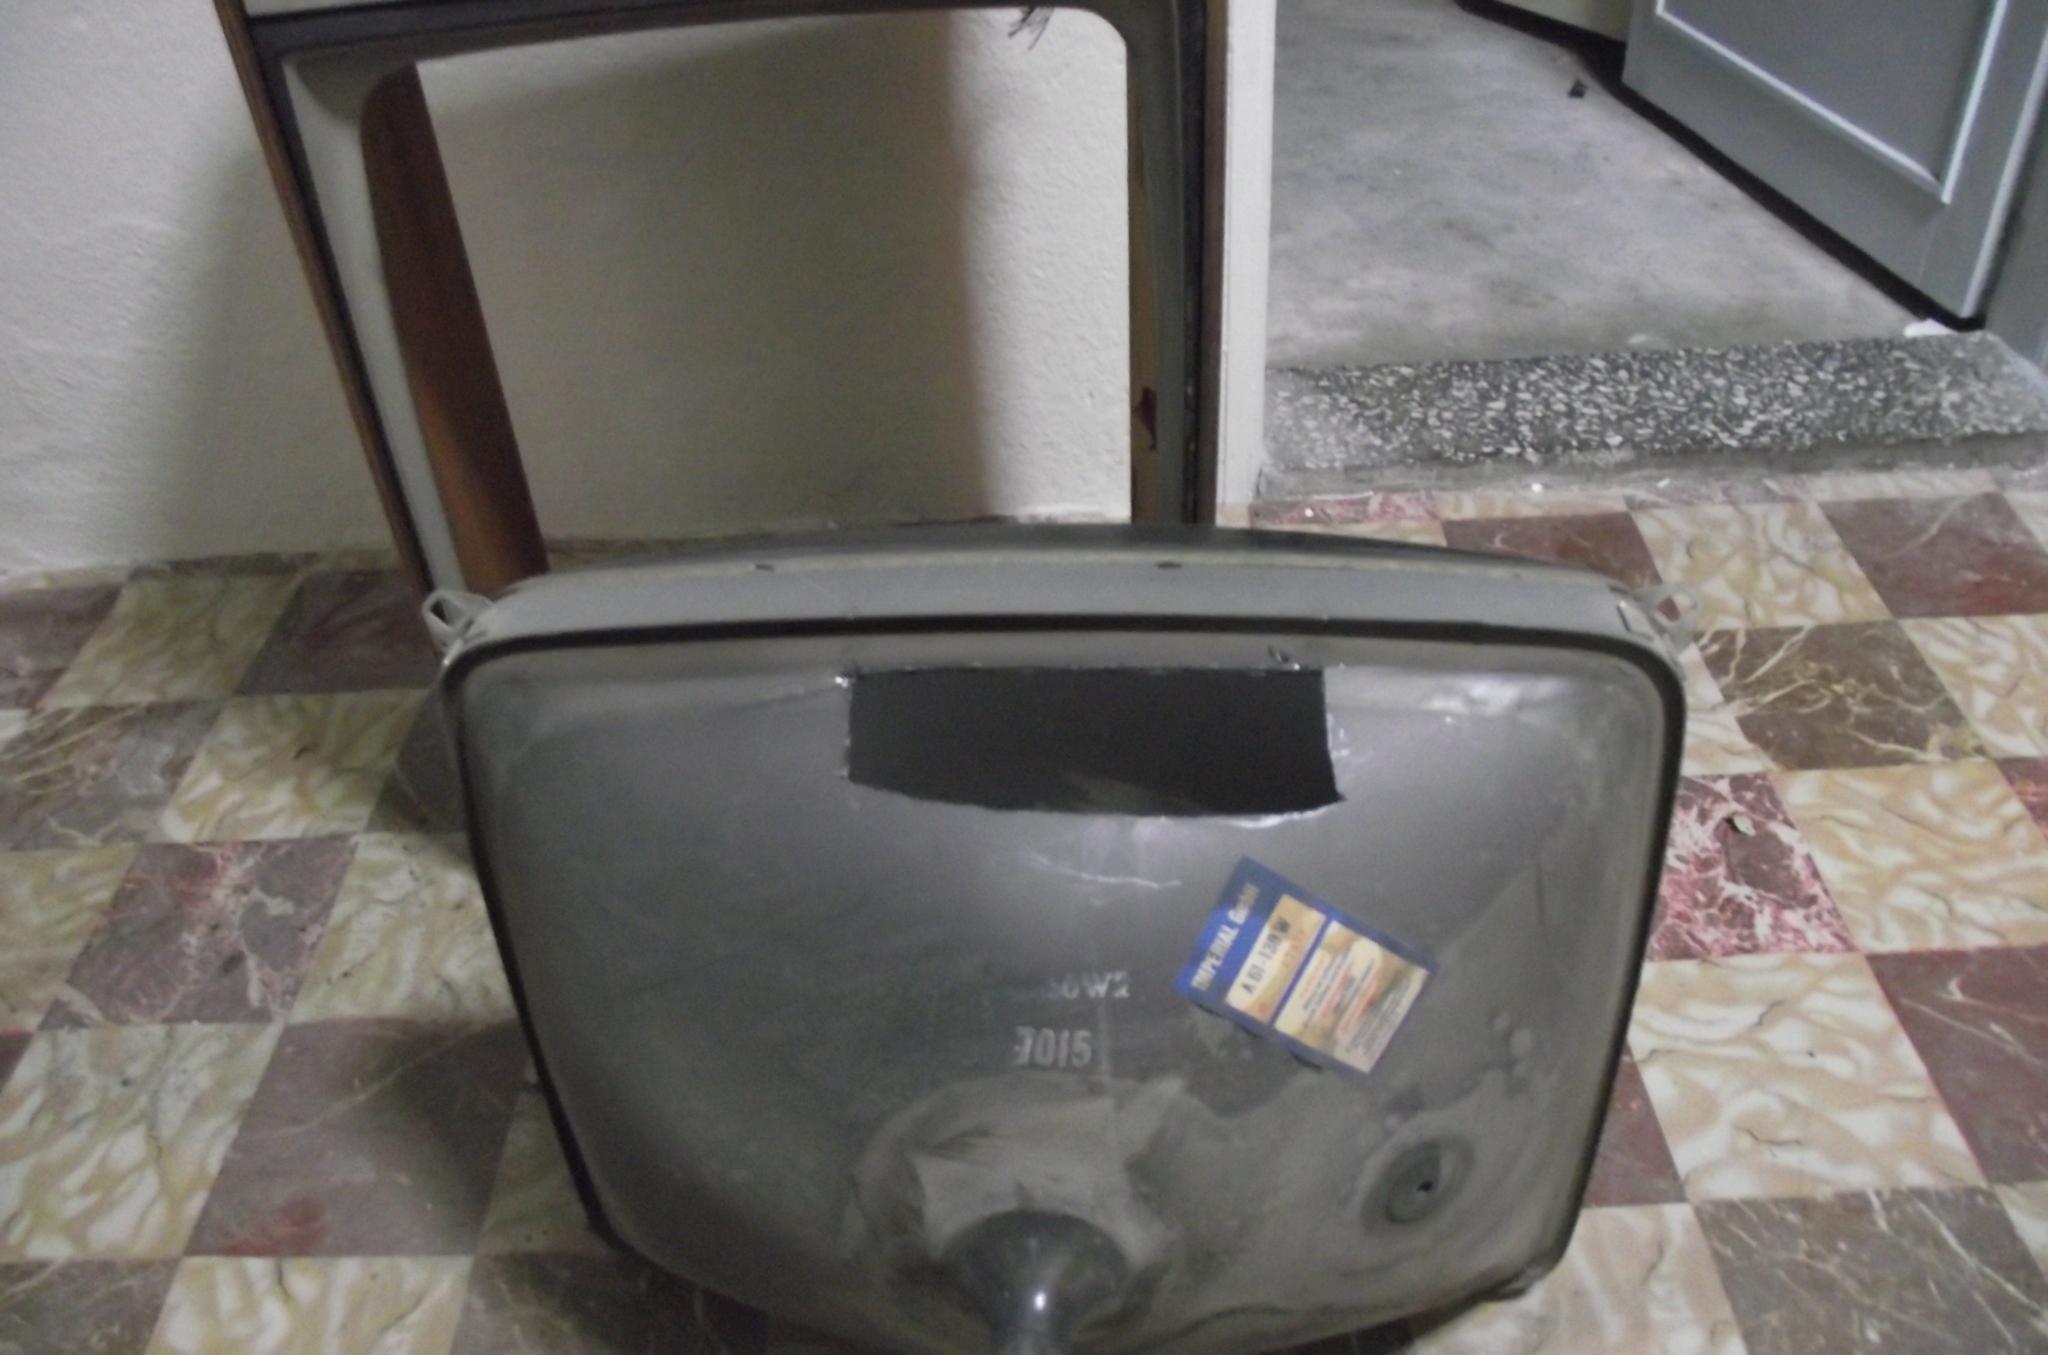 MlvbXk - TV'den akvaryum